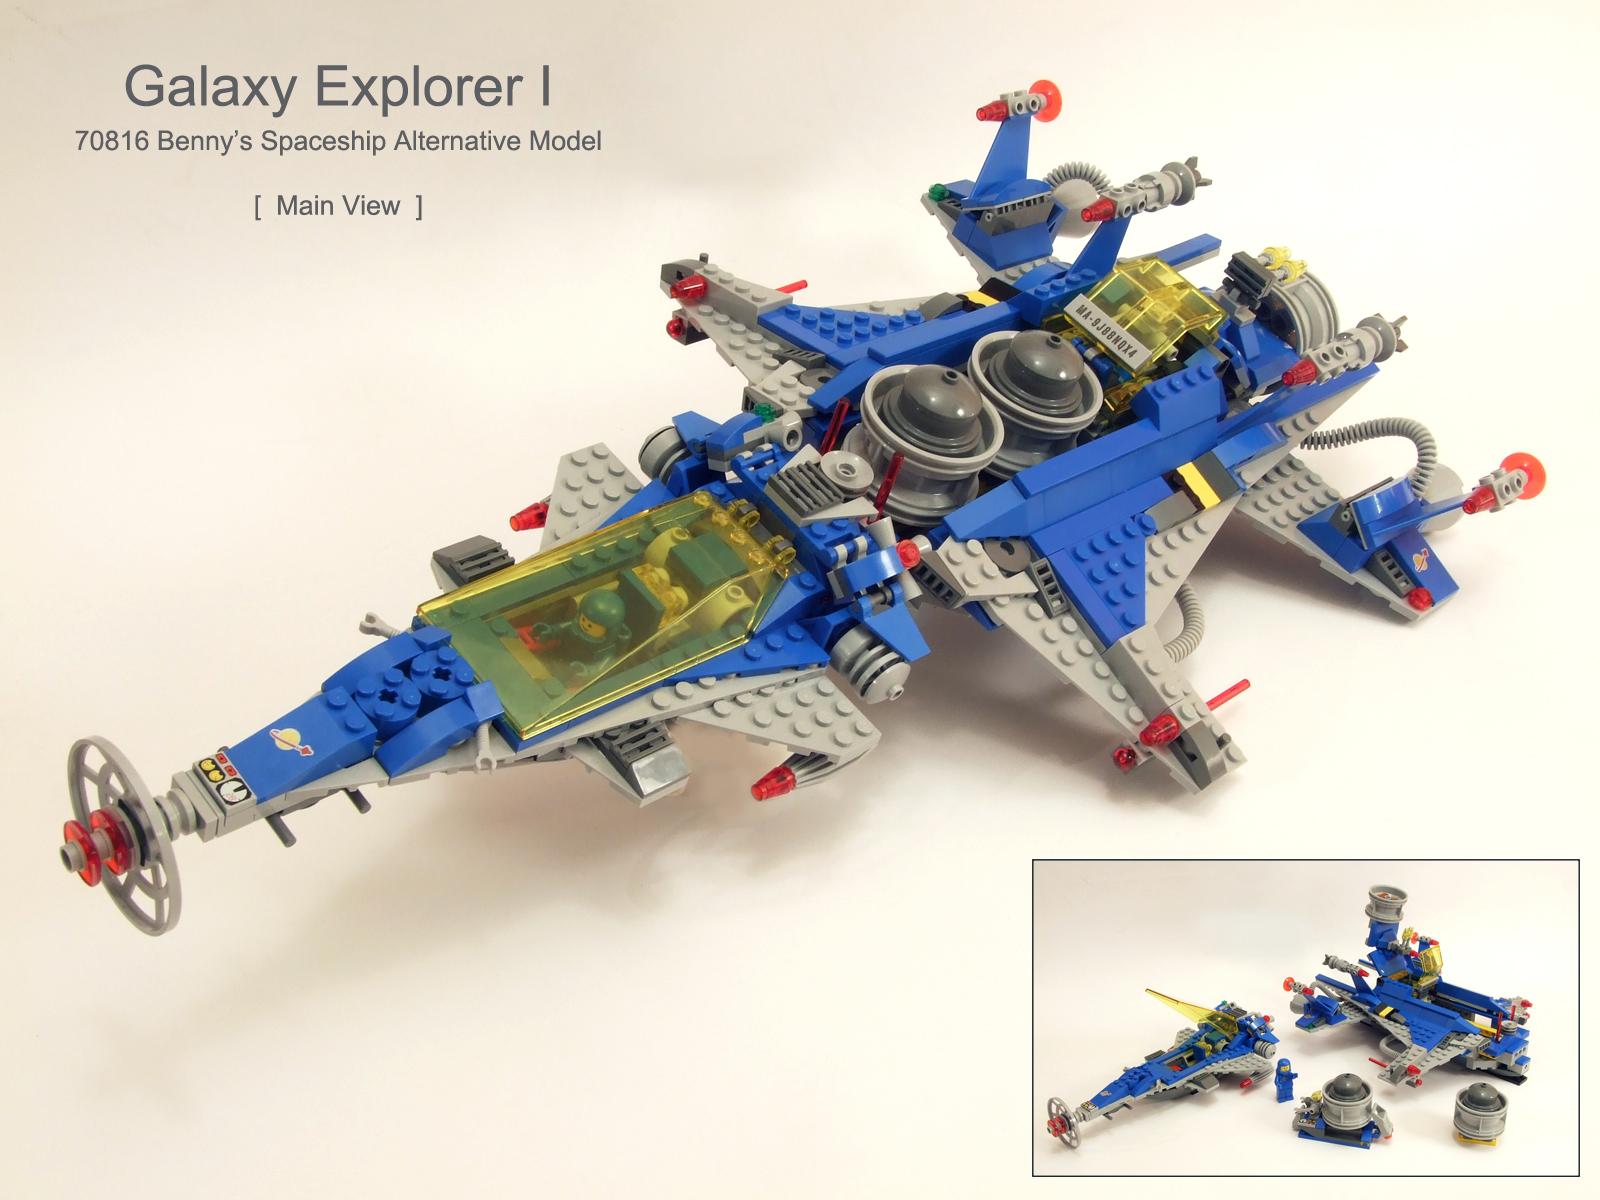 Model Galaxy E Vehicle Lego Eship Toy Machine Explorer Benny Clic Alternative Motor